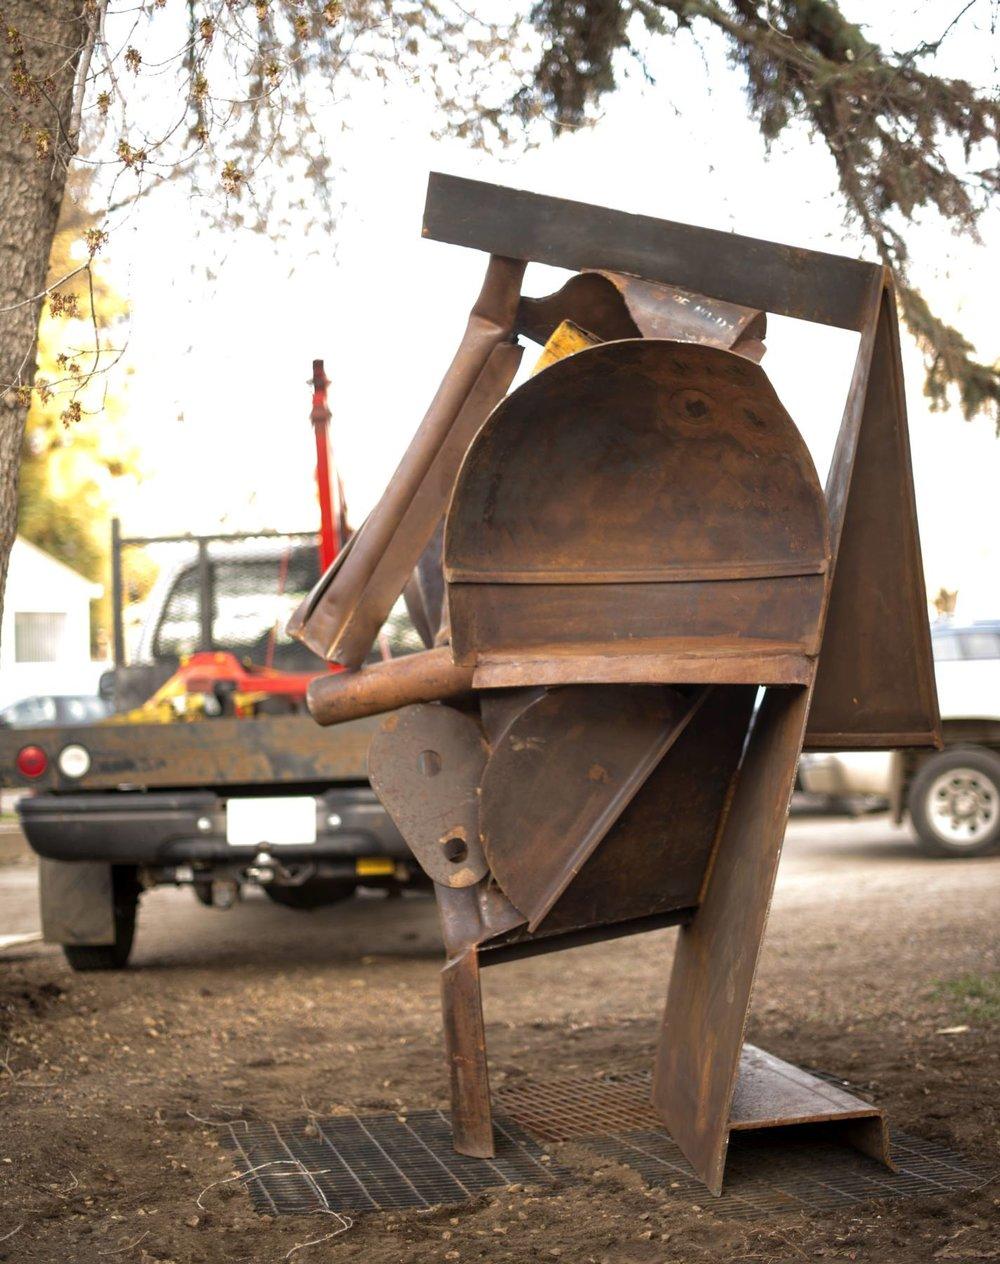 Hellmund Studio - Andrew C. Hellmund  |  Sculptor + Educator